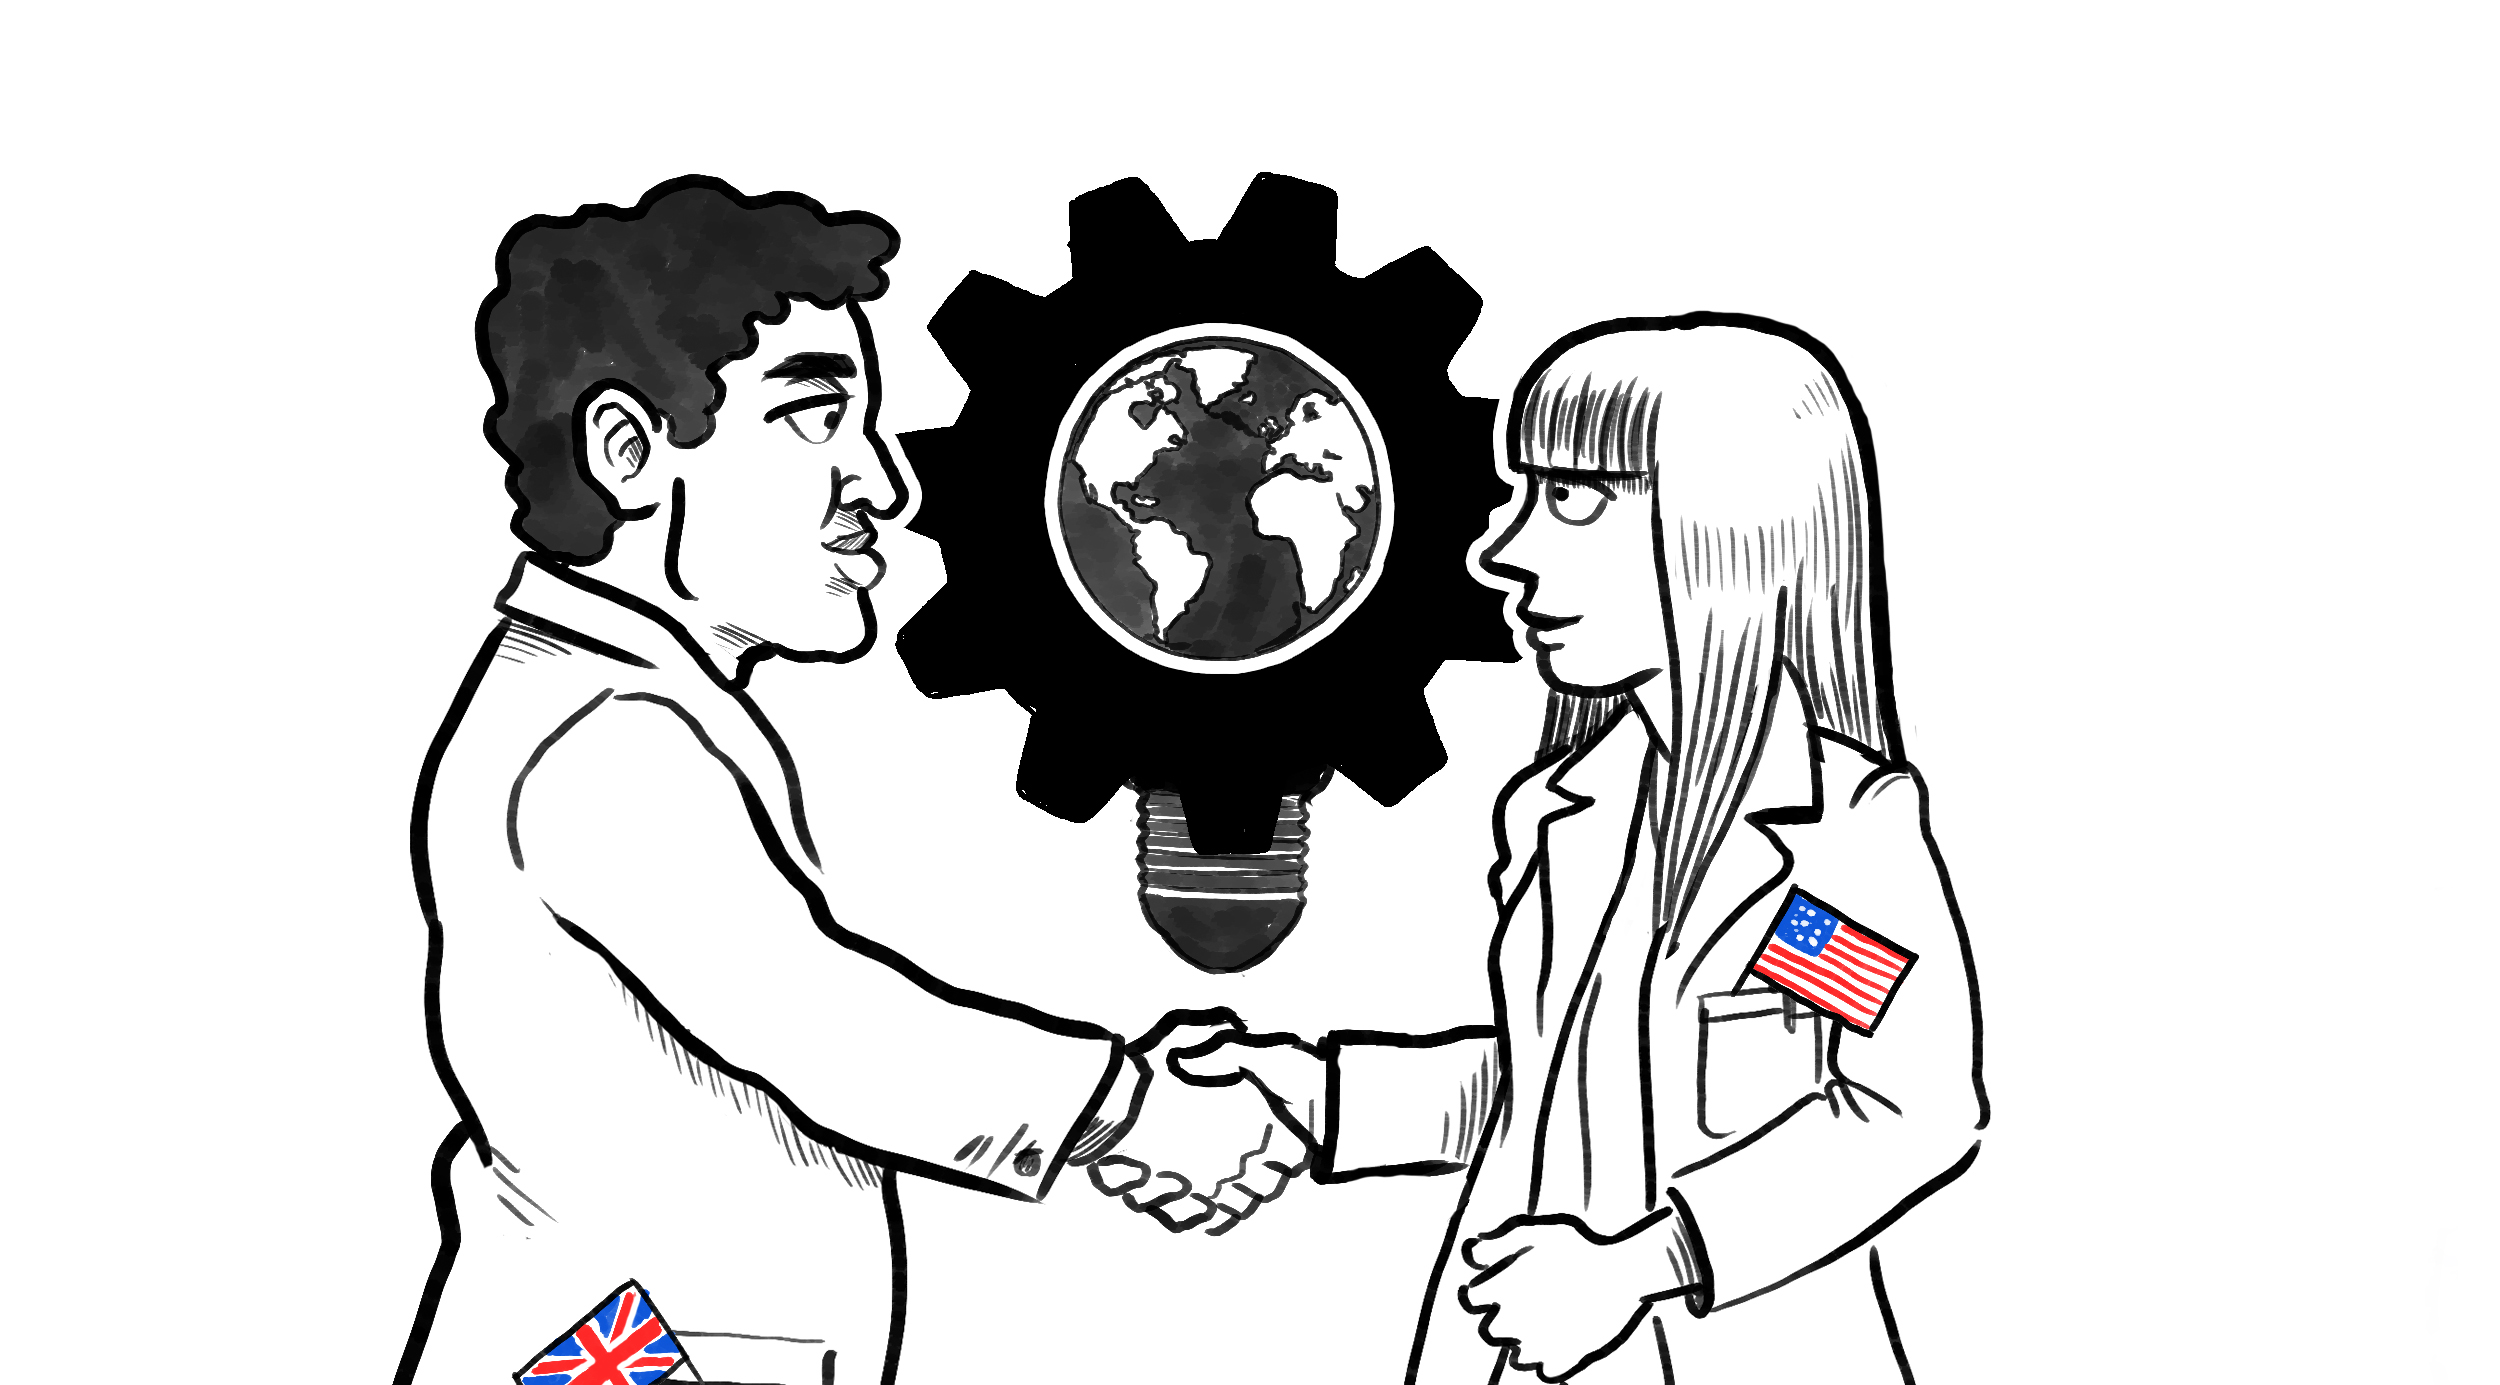 rcuk-uk-us-partnership-cognitive-06.jpg